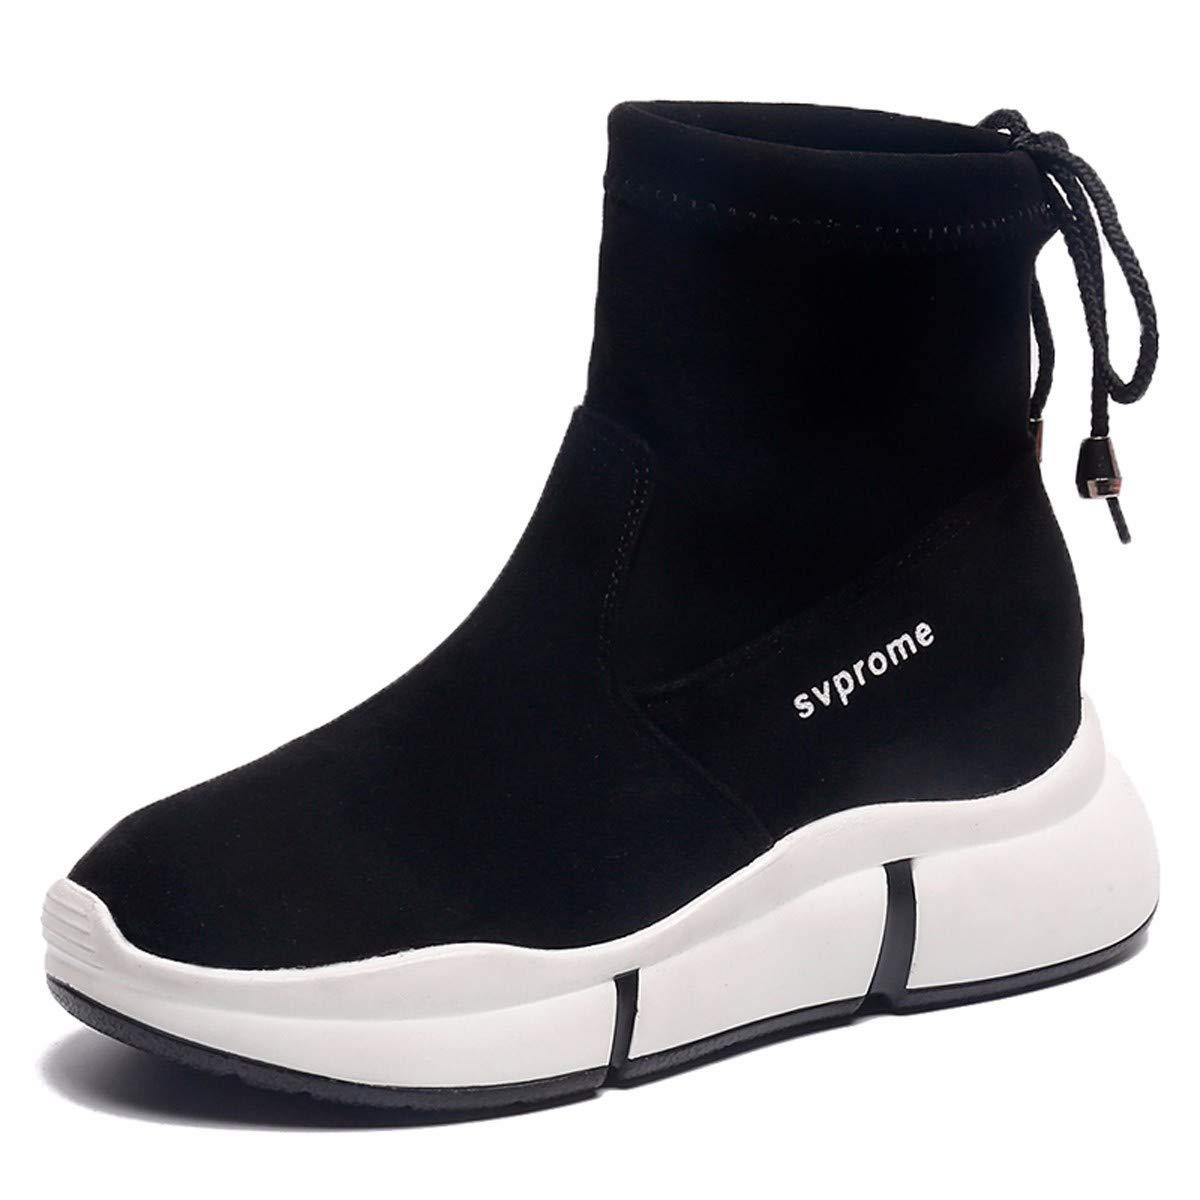 KPHY Damenschuhe/Herbst Kurze Stiefel Martin Stiefel Flachen Boden Stiefeln Student Damenschuhe Anti - Rutsch - Single - Stiefel.